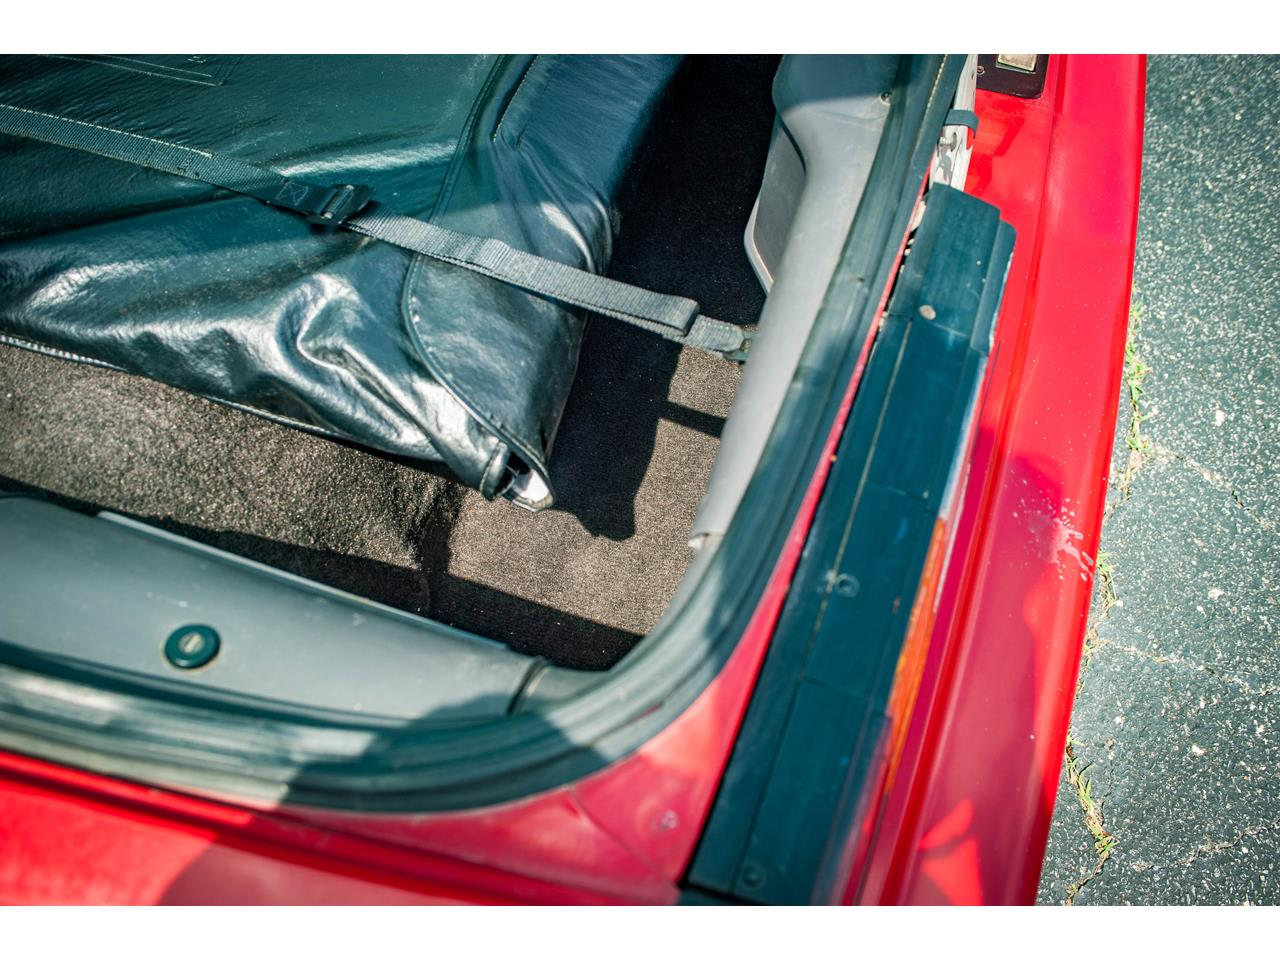 Large Picture of '84 Chevrolet Camaro located in O'Fallon Illinois - $9,500.00 - QB9Y